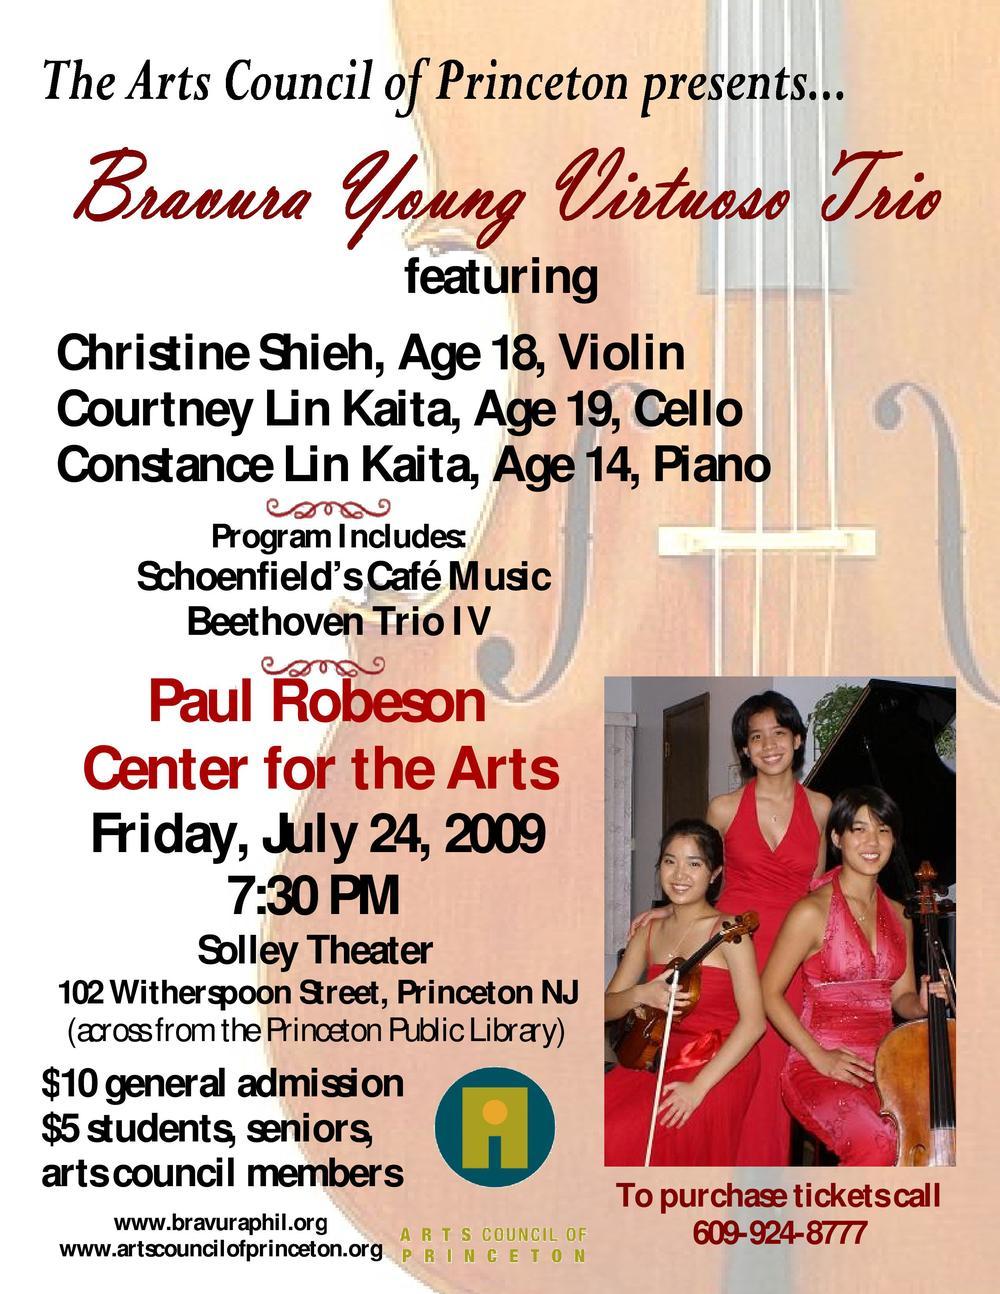 Bravura Young Virtuoso-page-001.jpg